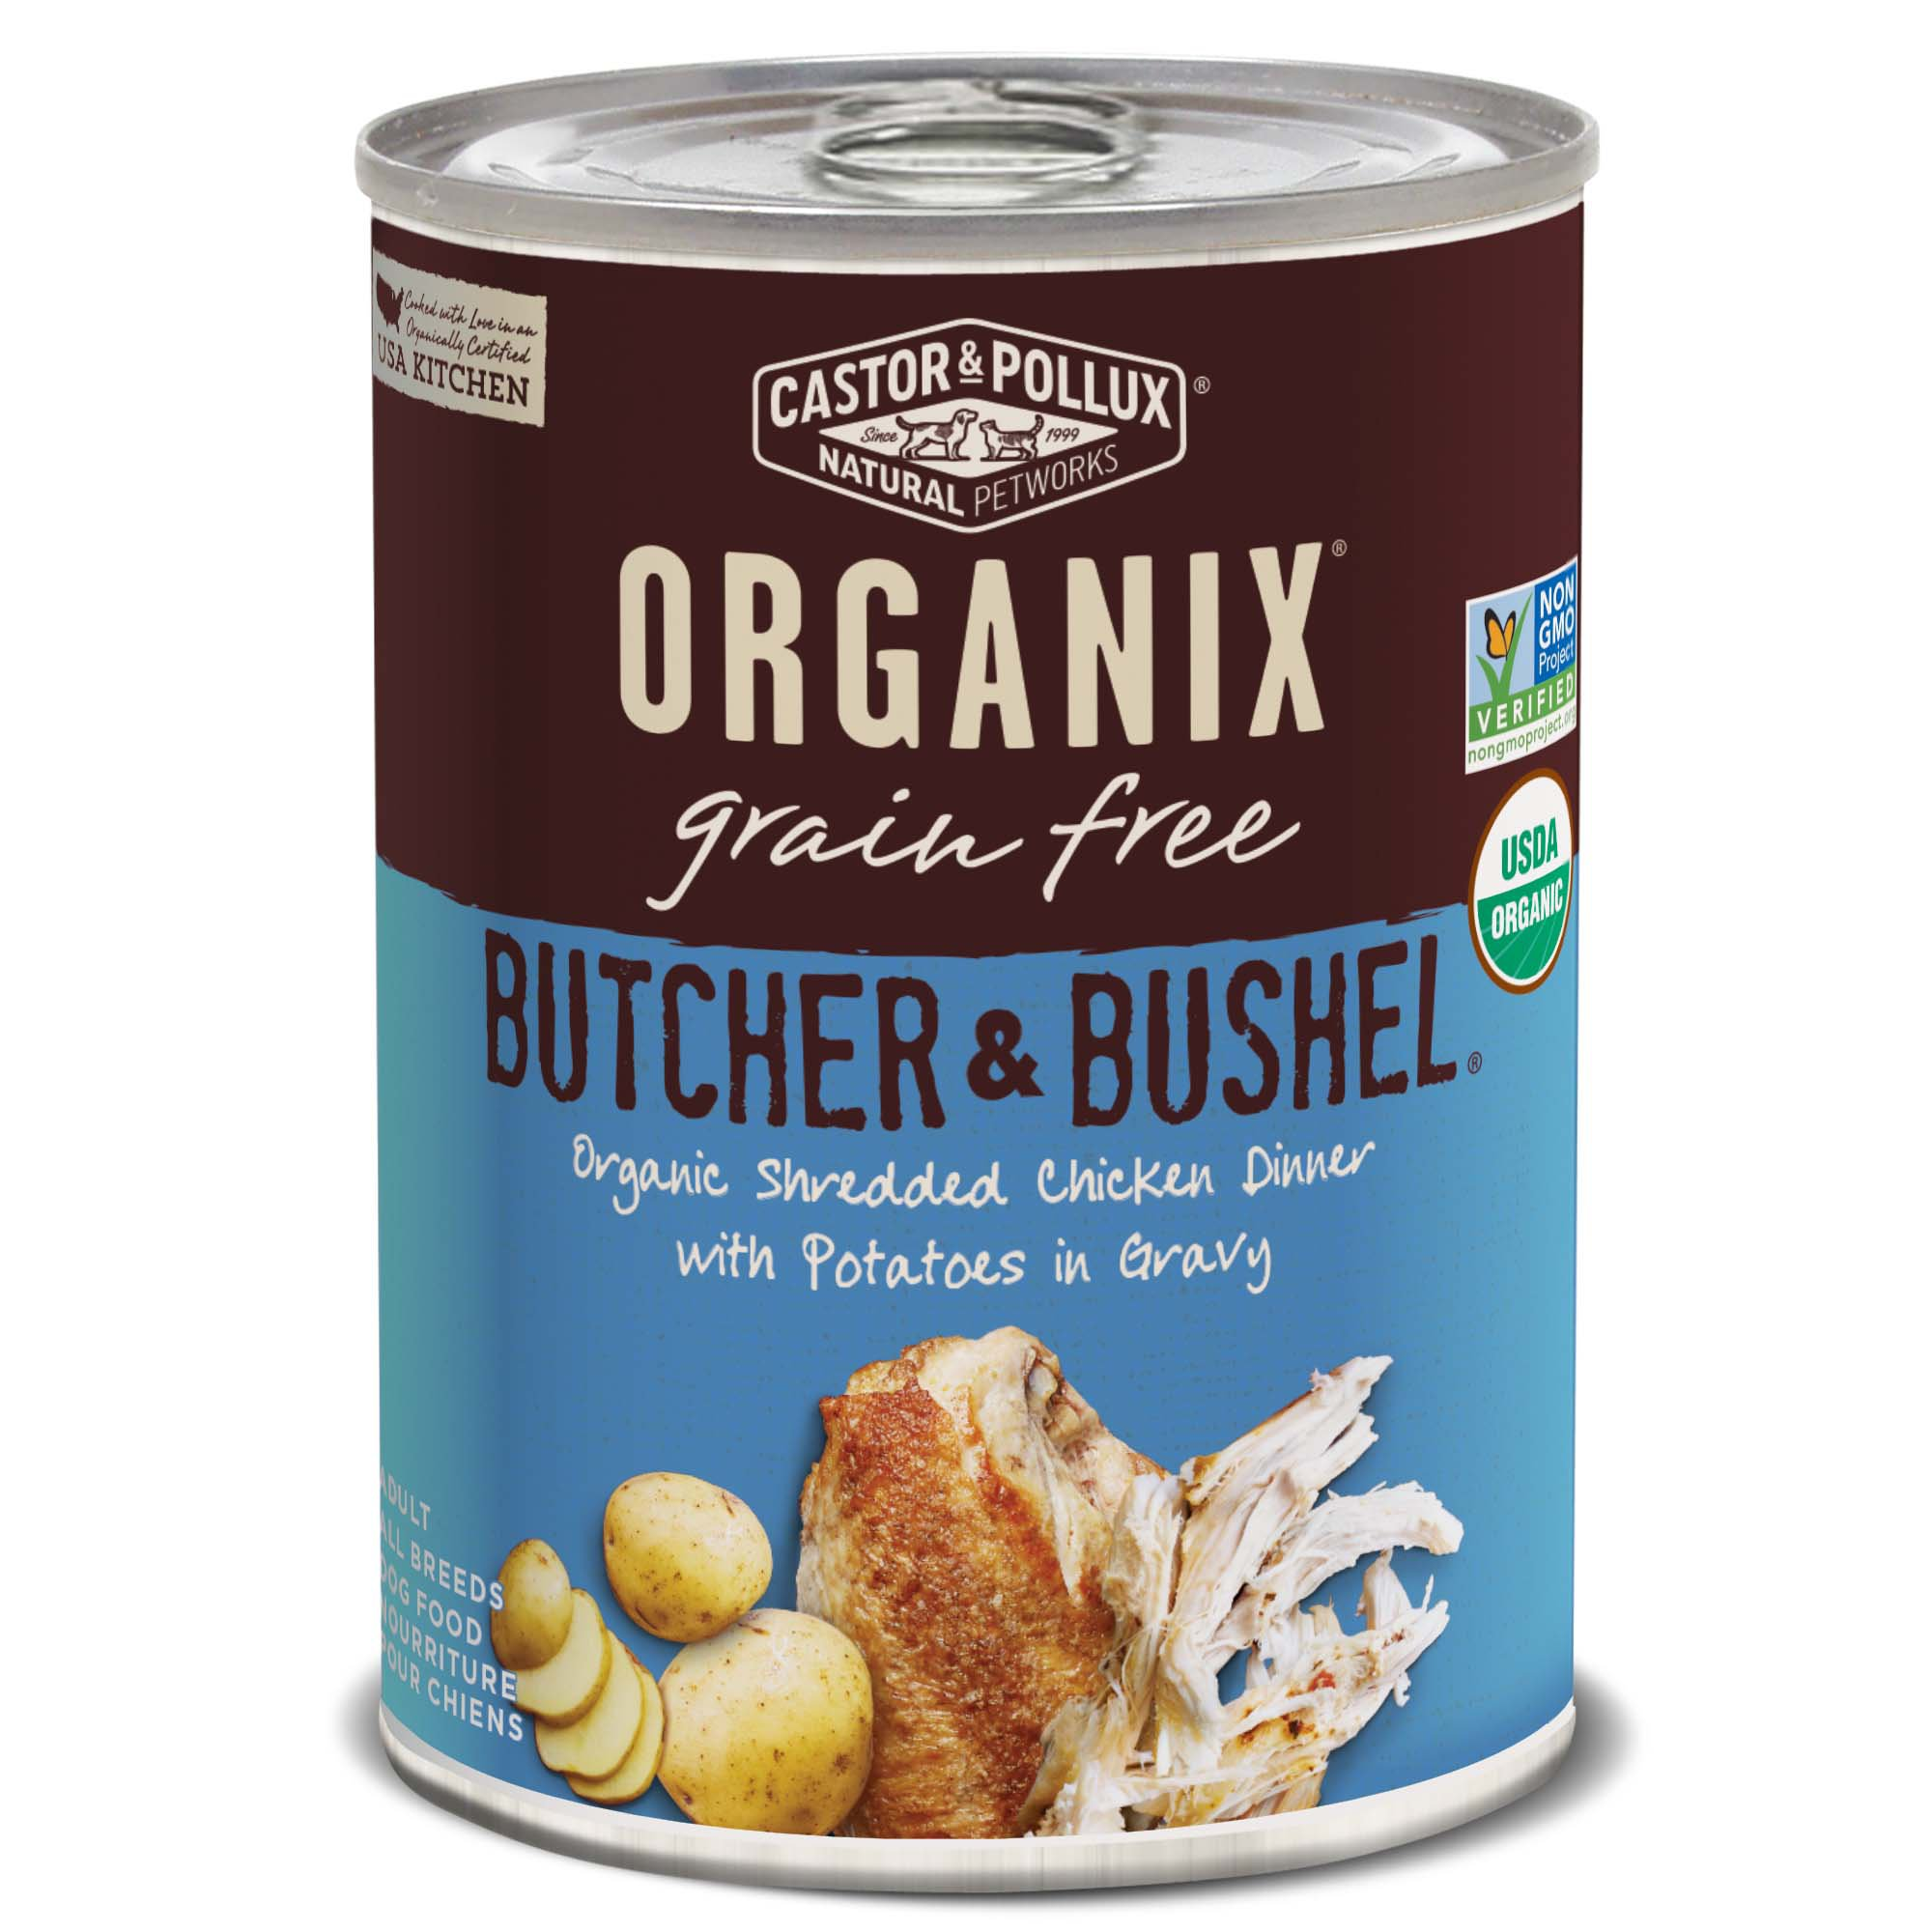 Castor Pollux Organix Butcher Bushel Organic Tender Chicken